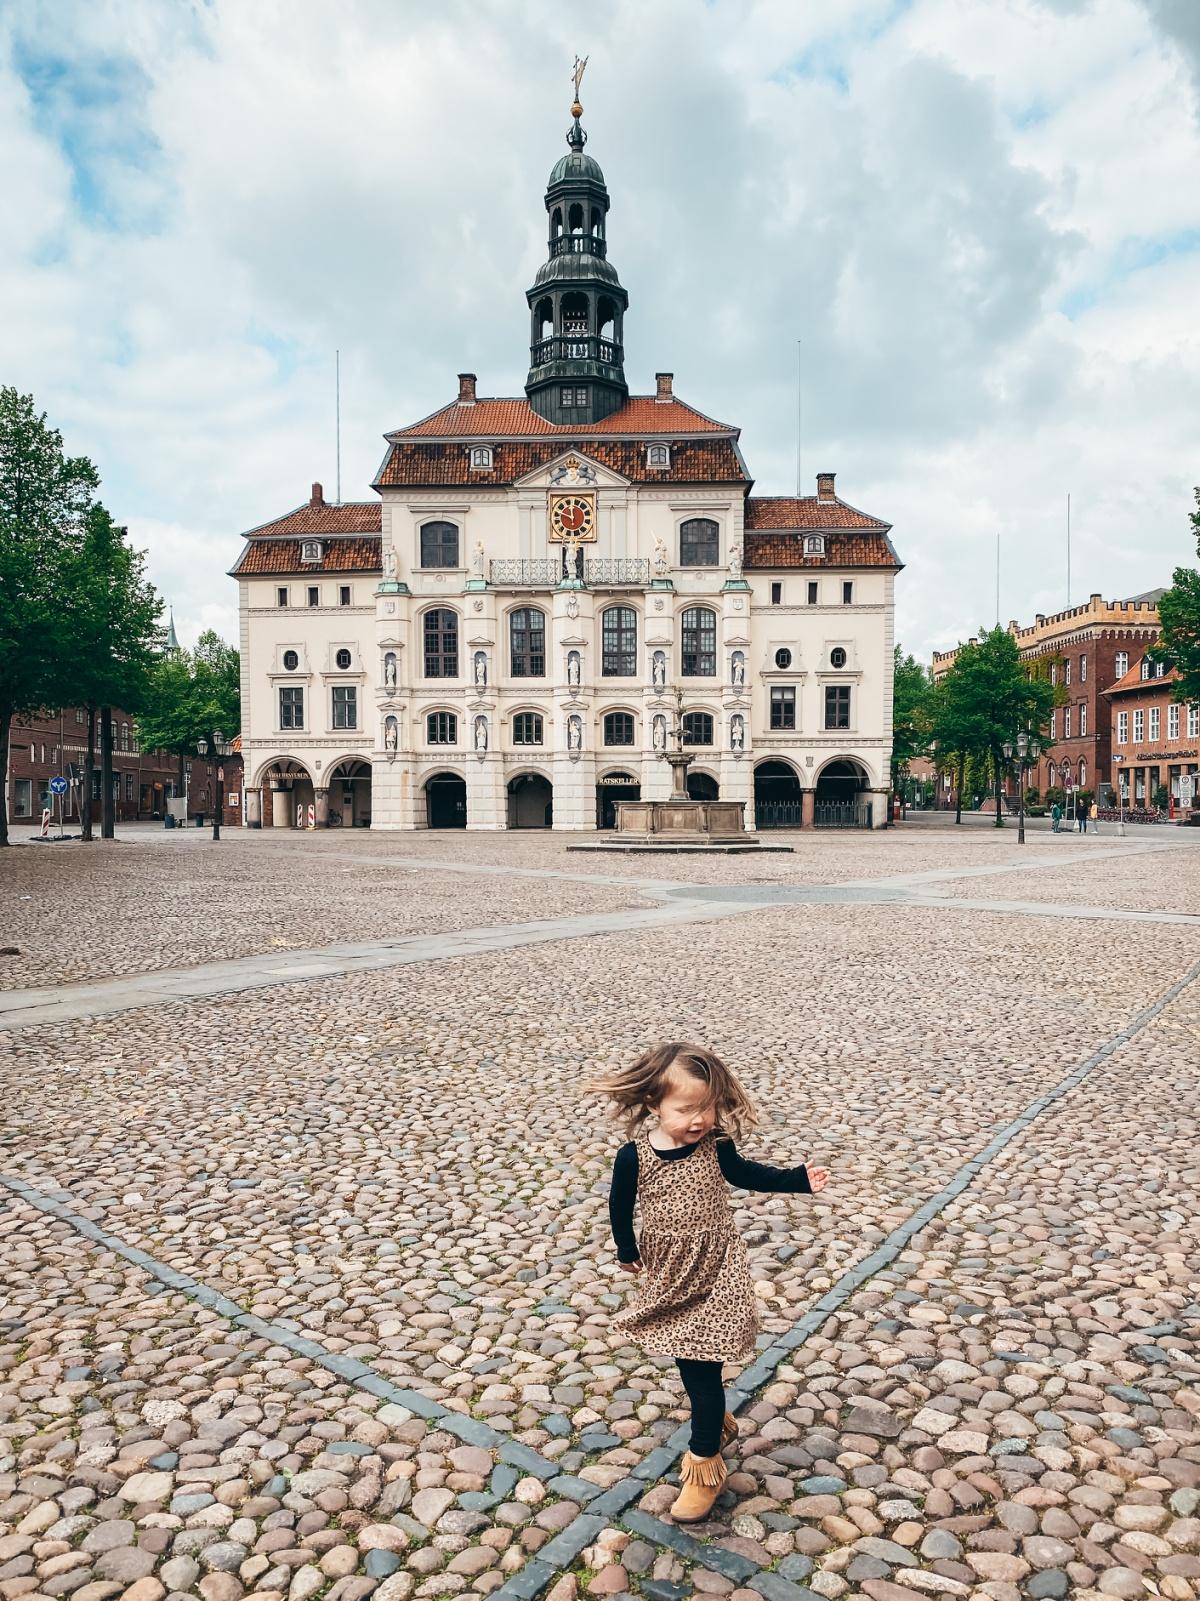 Visiting Luneburg, Germany